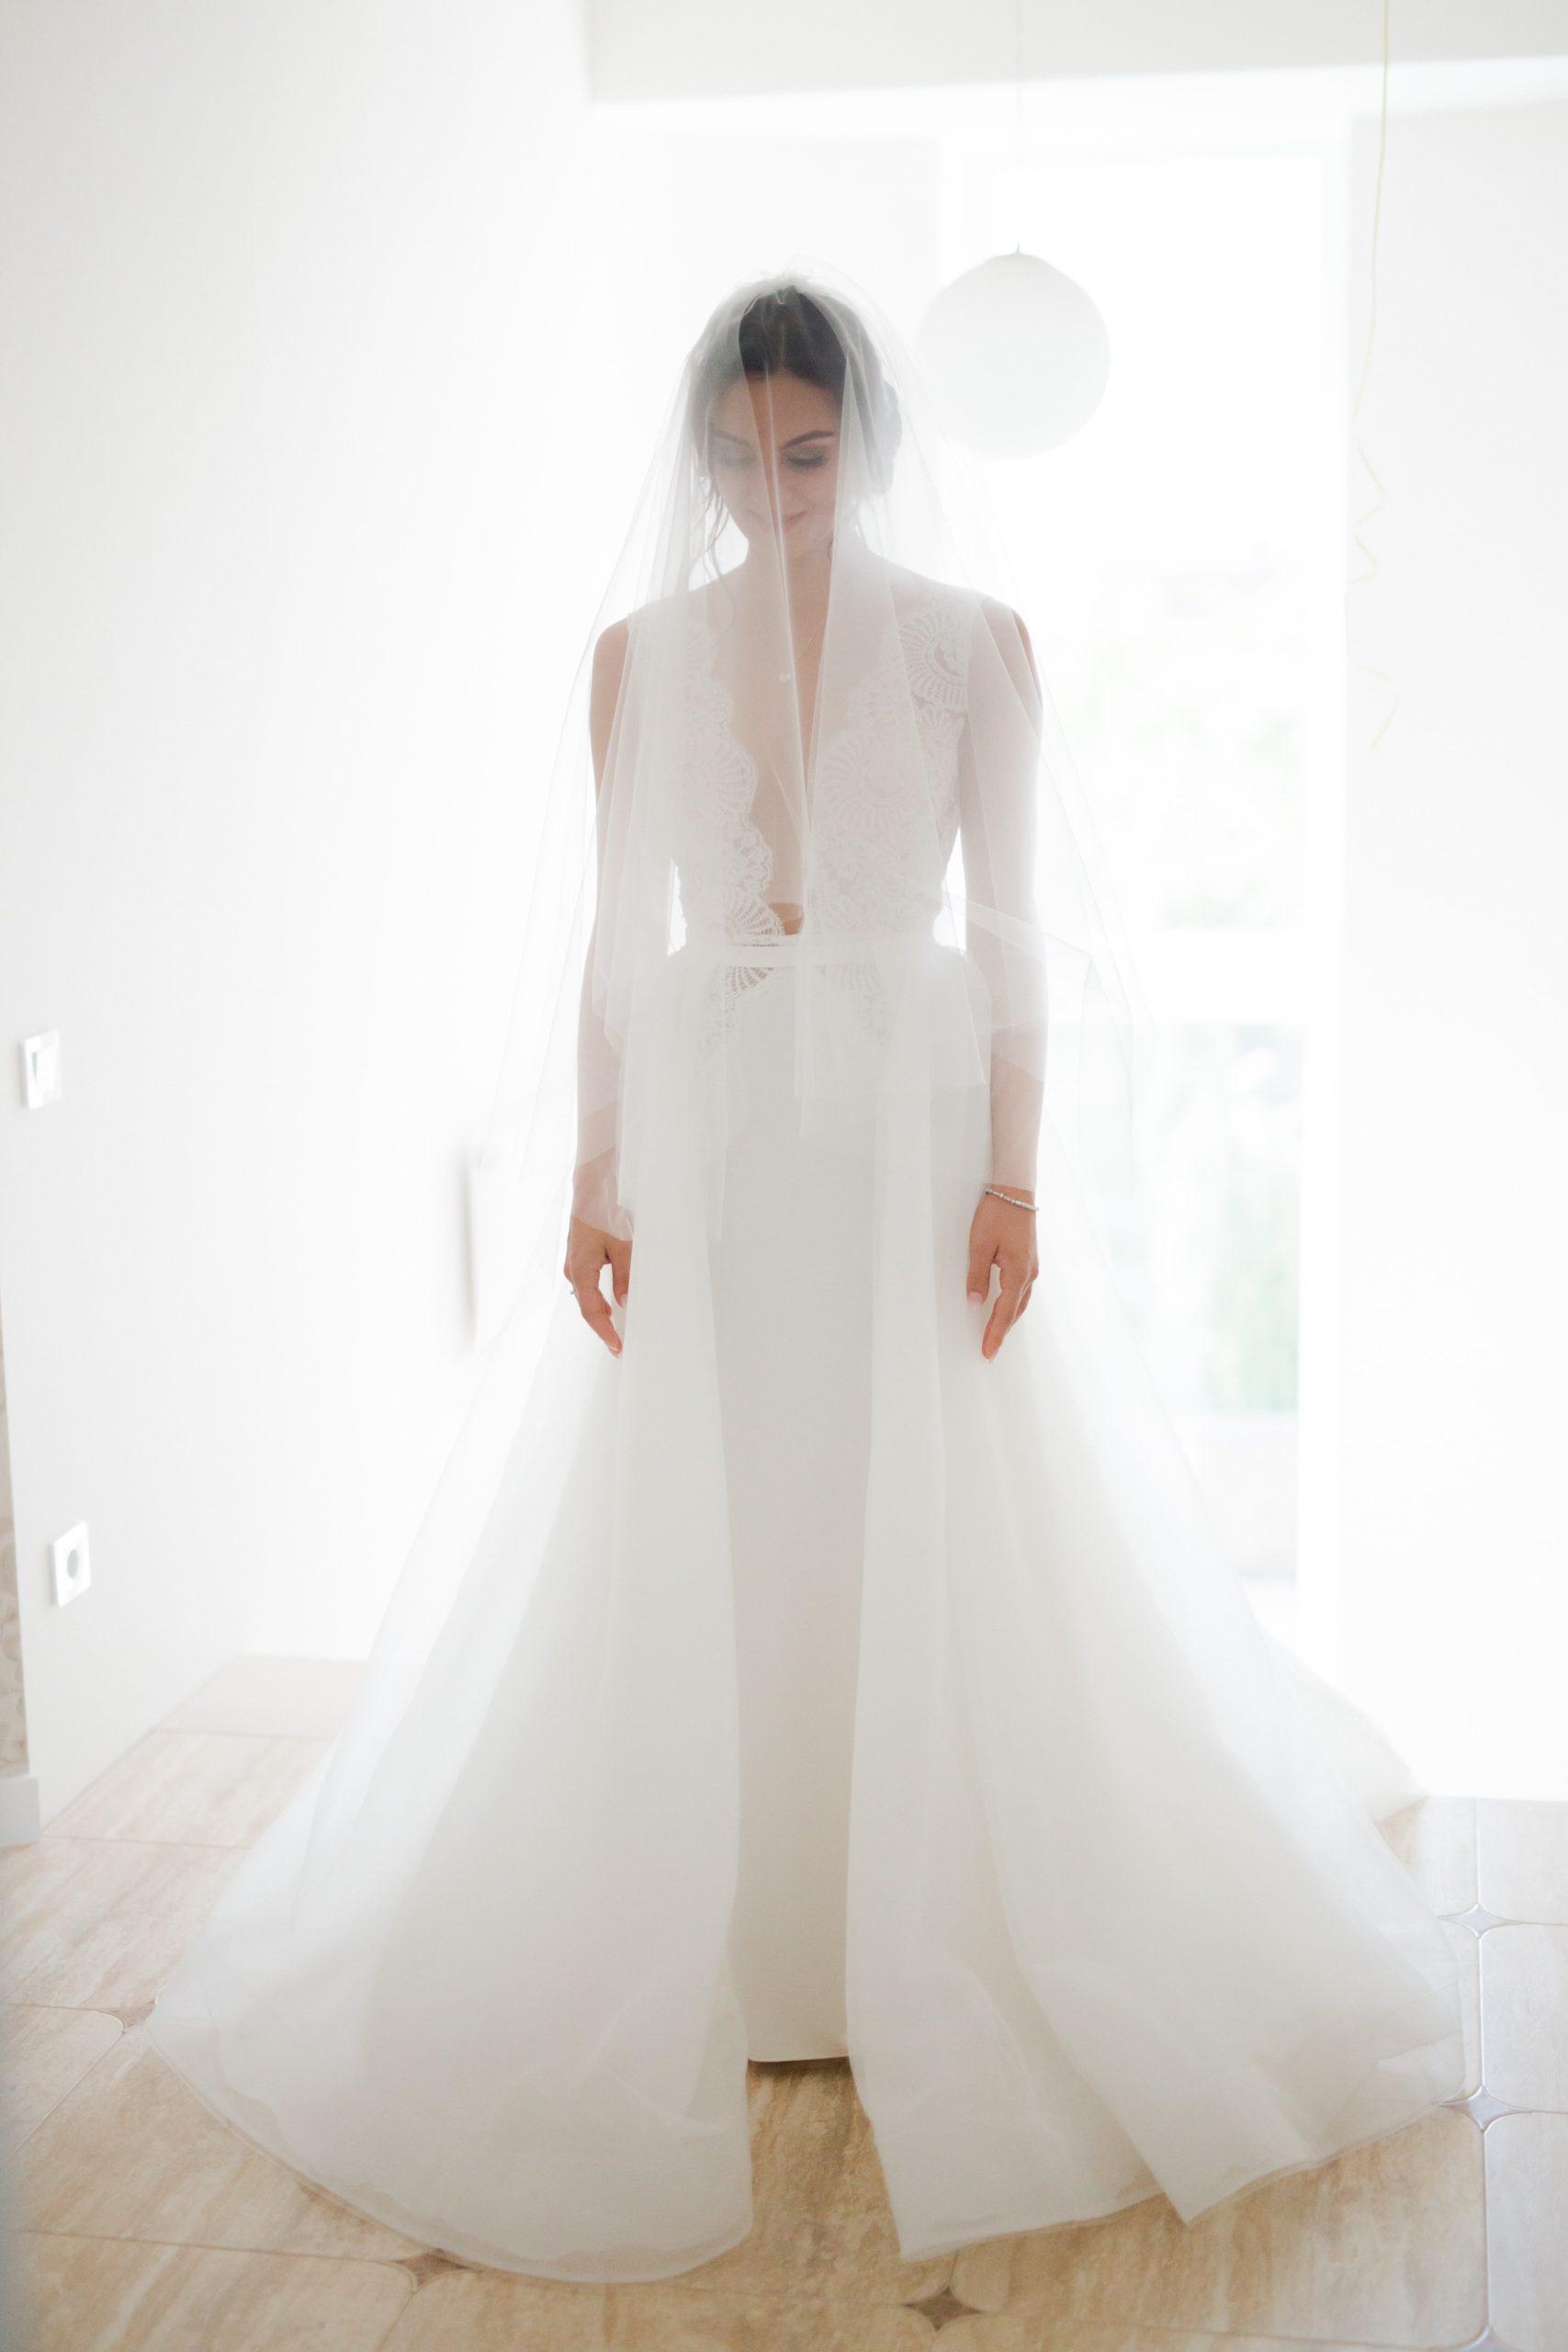 Model Dana|Our Bride